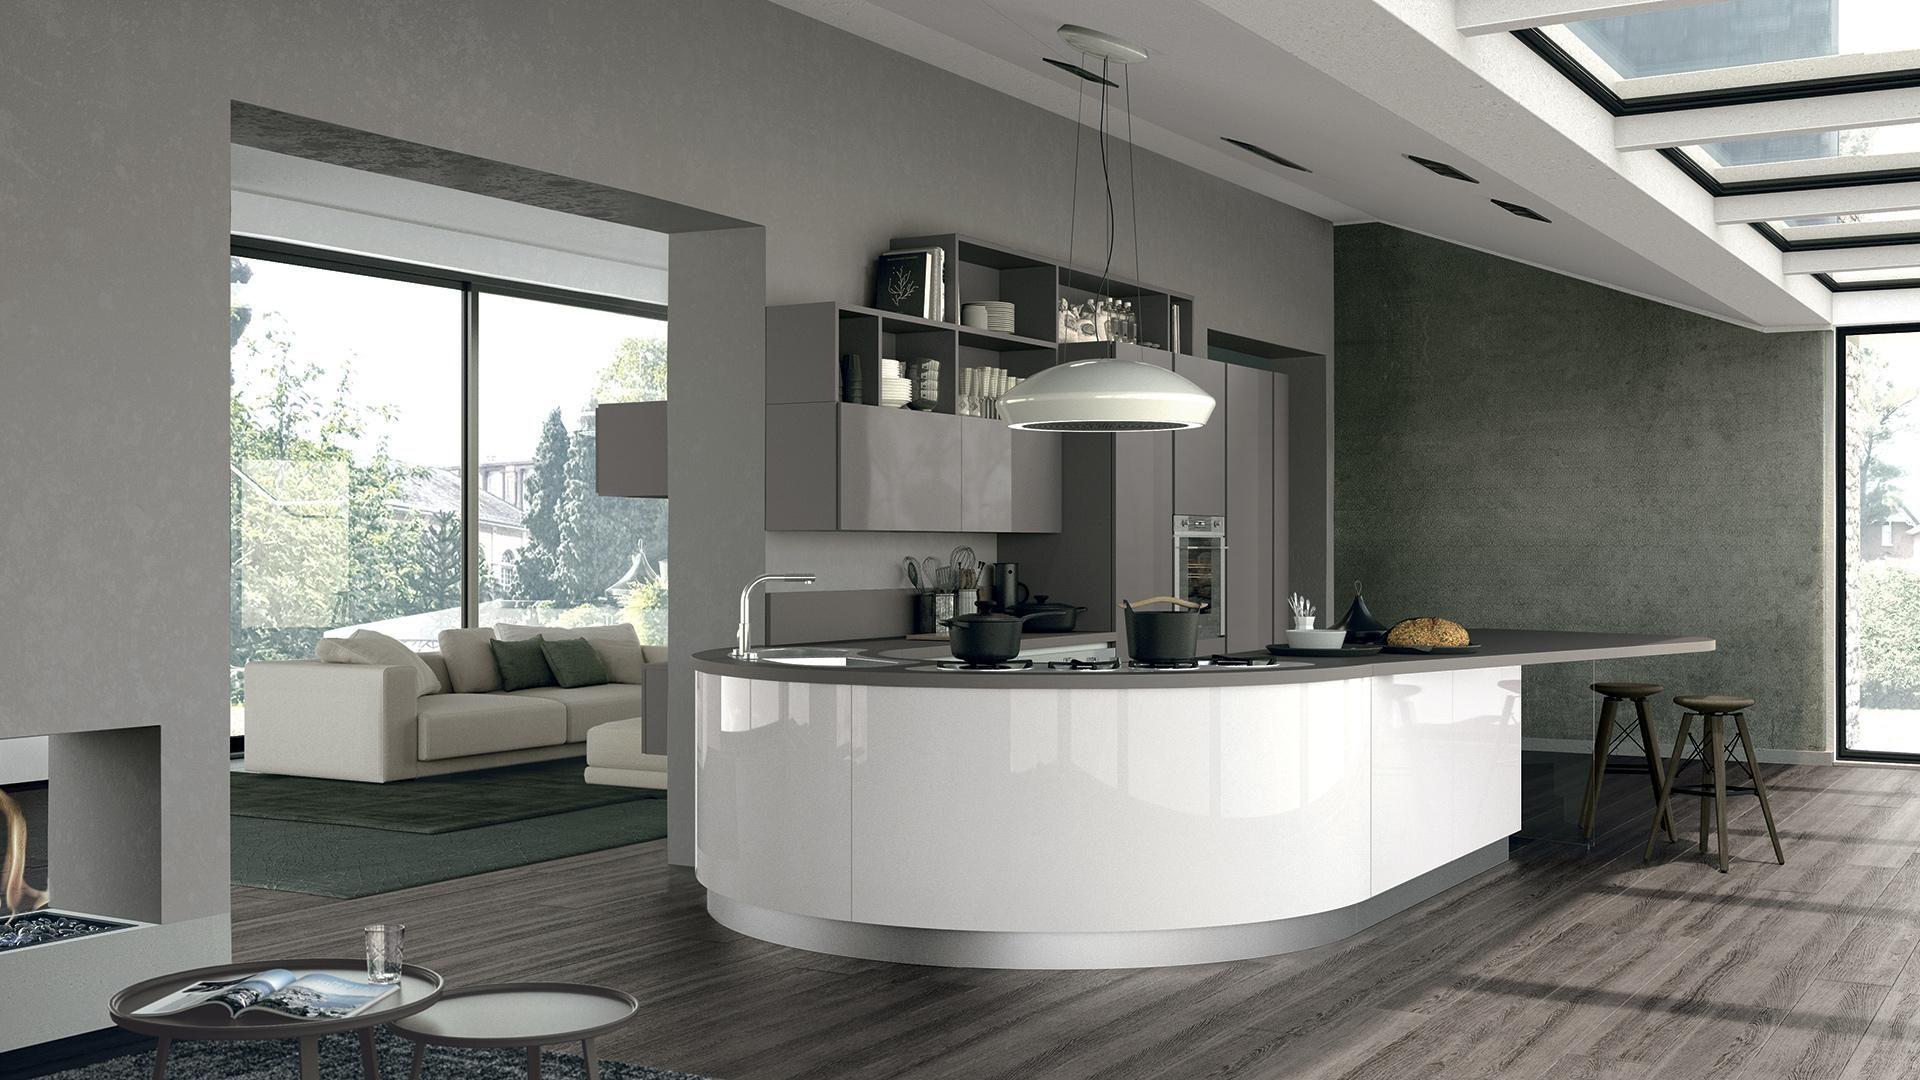 Cucina Lube Moderna.Clover Cucina Lube Moderna Home Ideas Peninsula